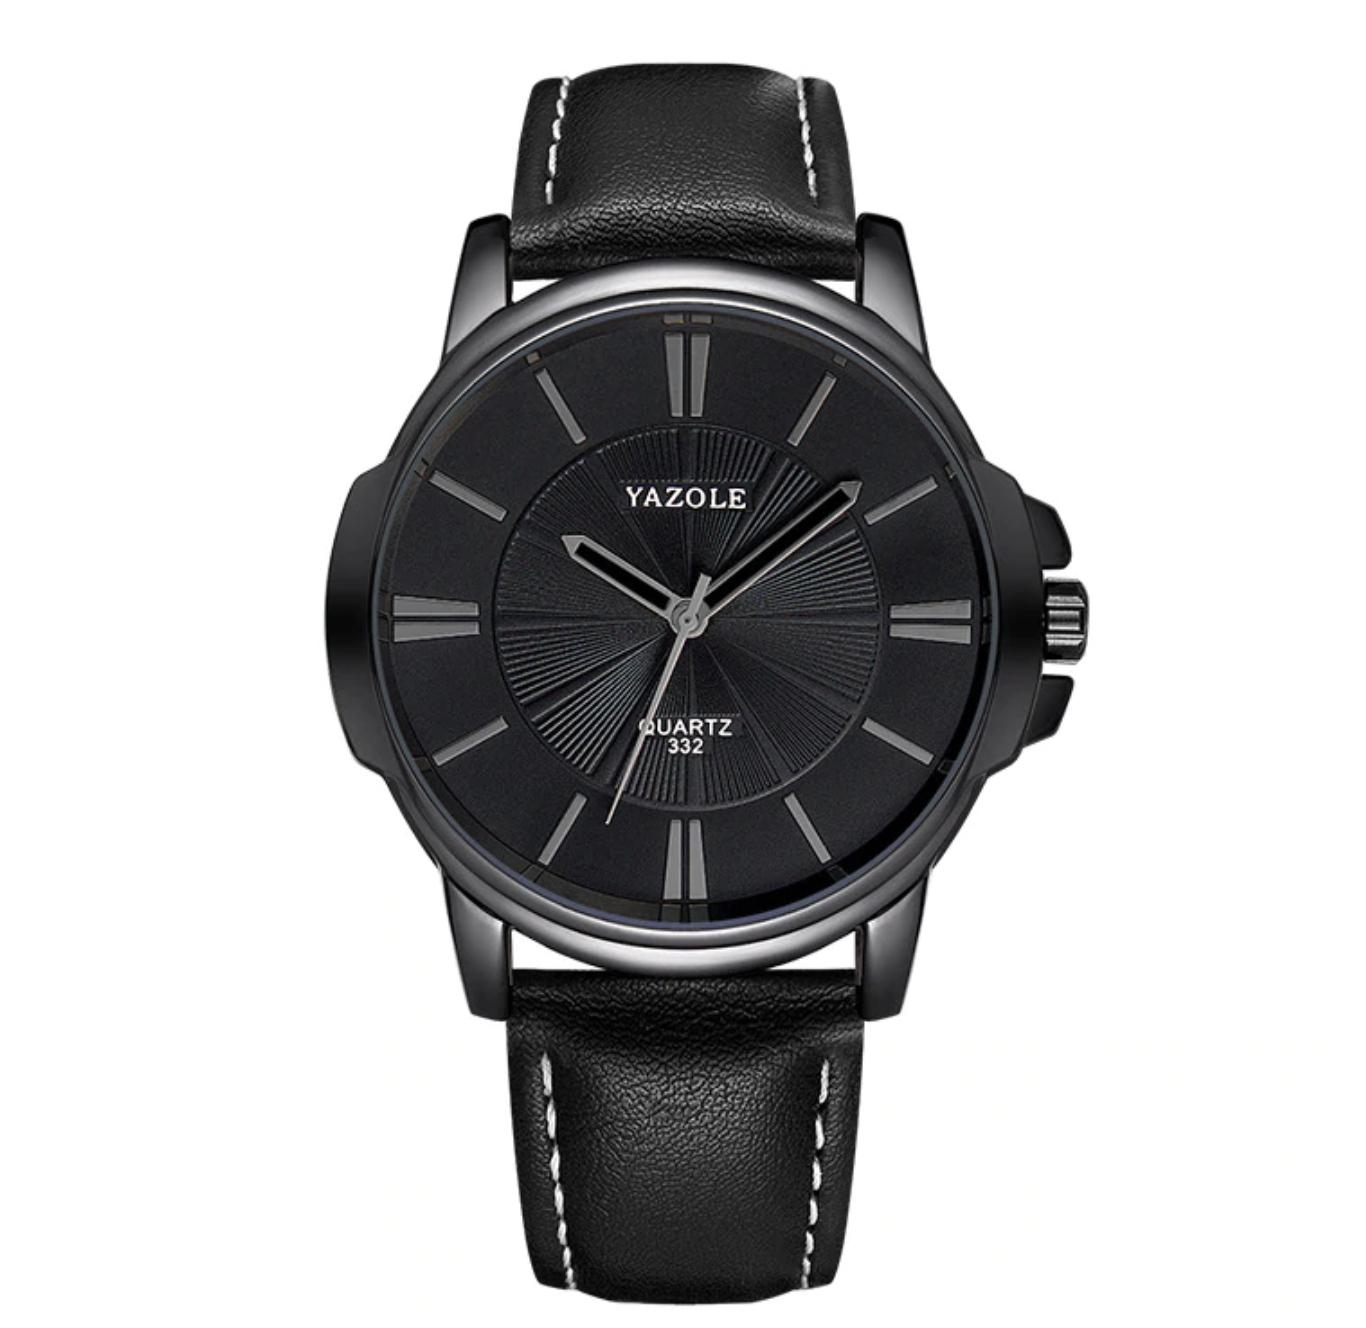 Relógio Masculino Casual/Social Yazole 332 Aço Inox